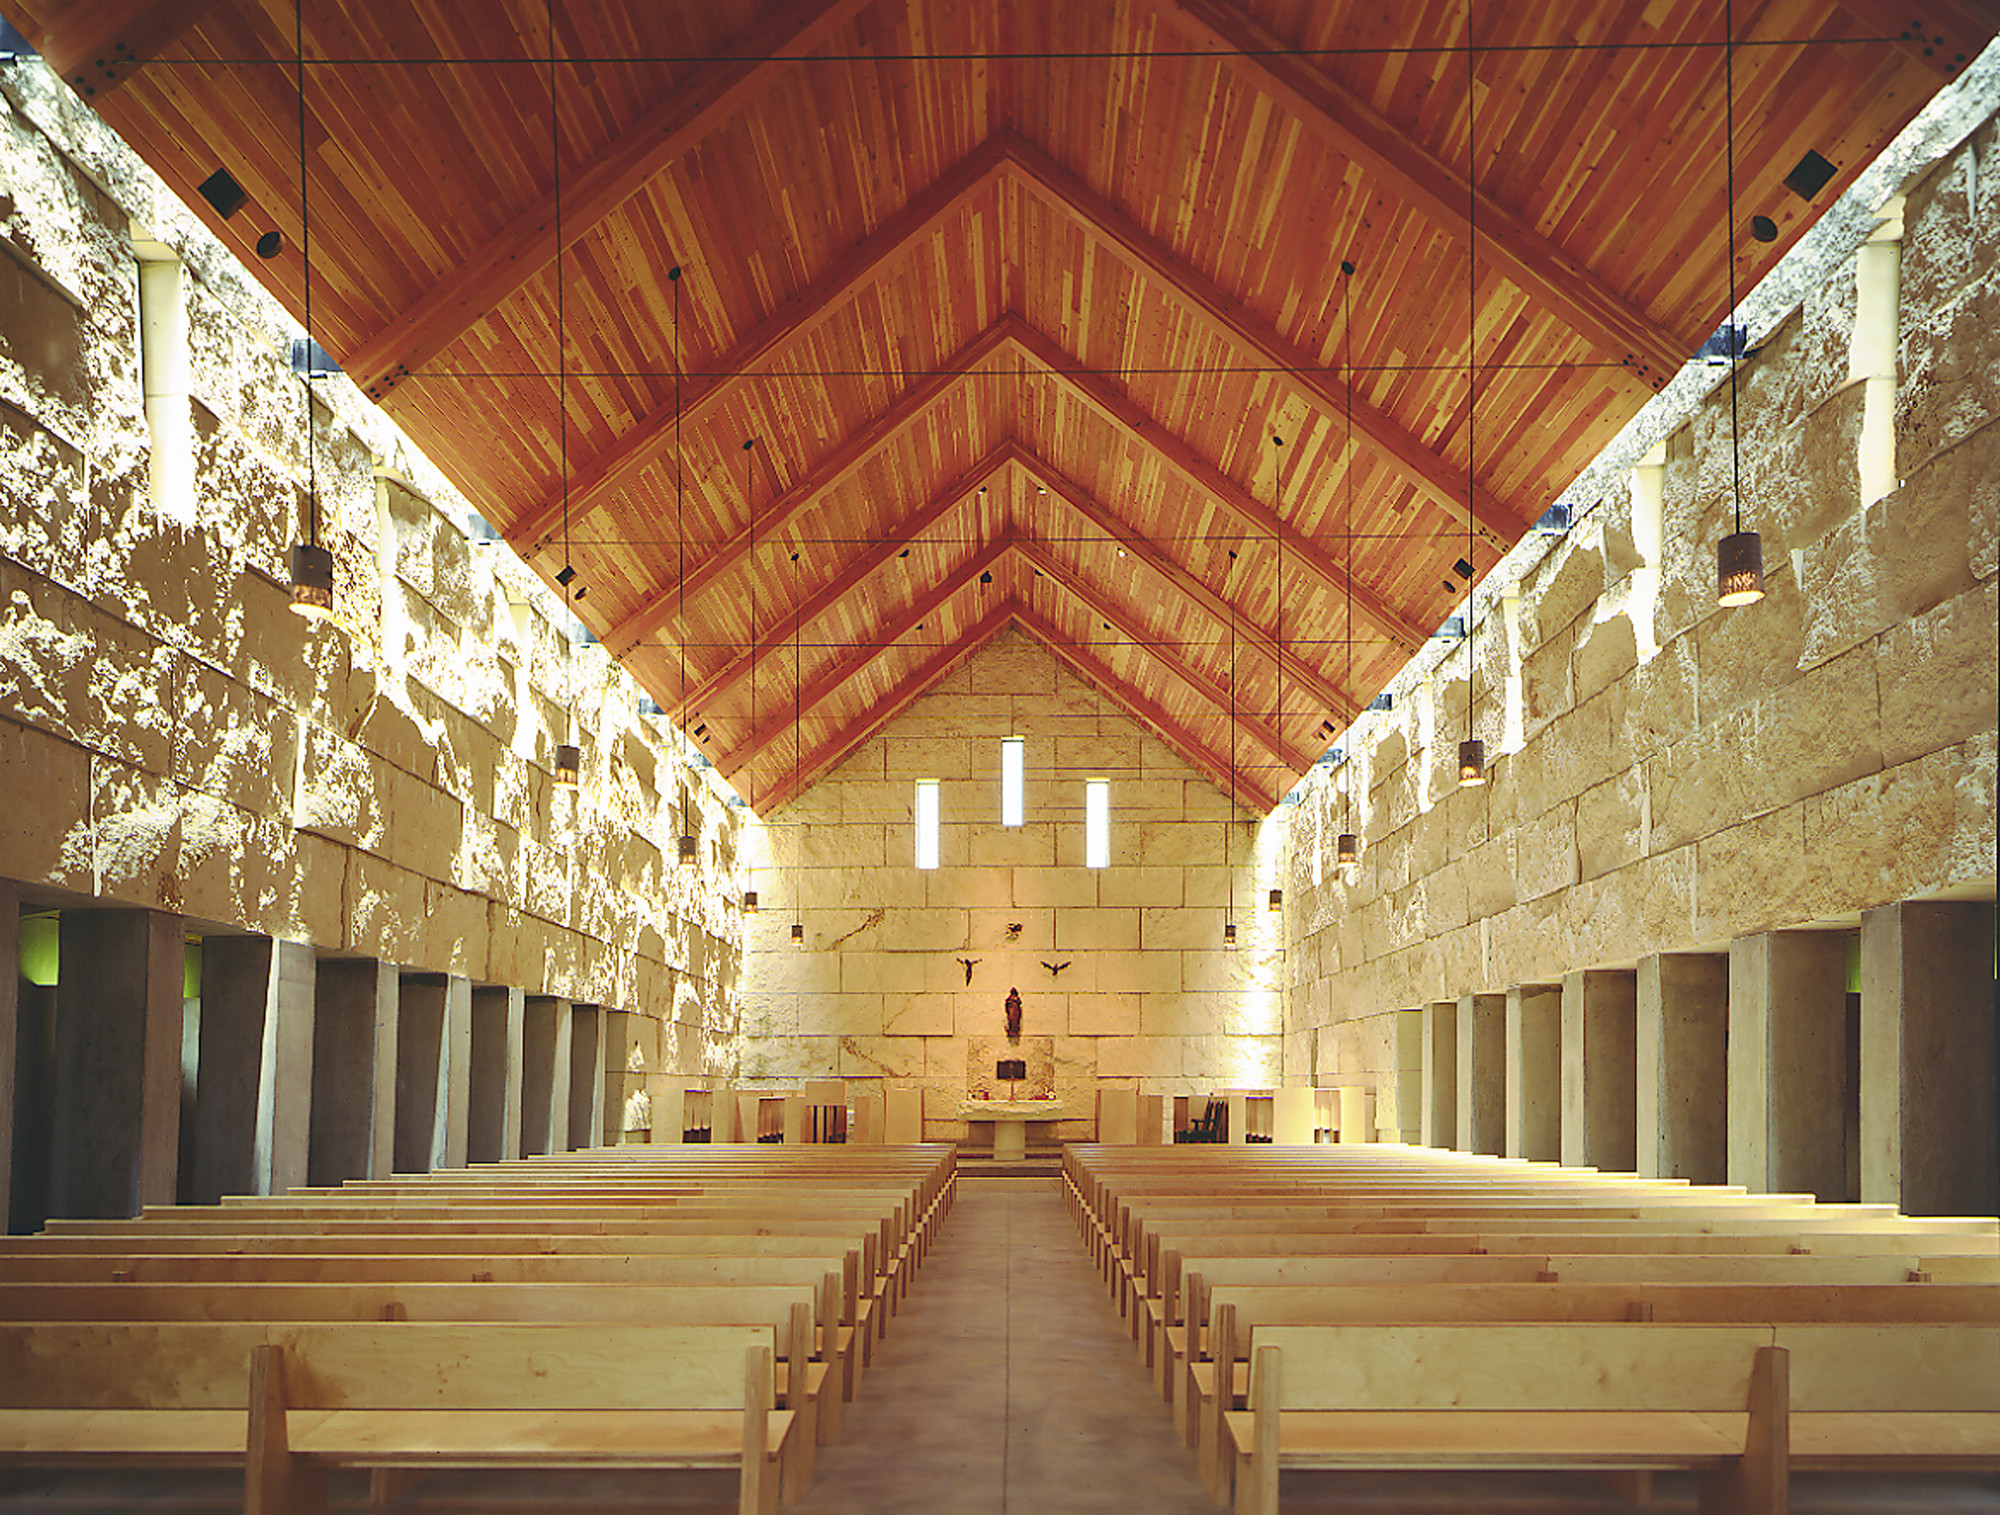 Cistercian Abbey Church / Cunningham Architects, © James F. Wilson